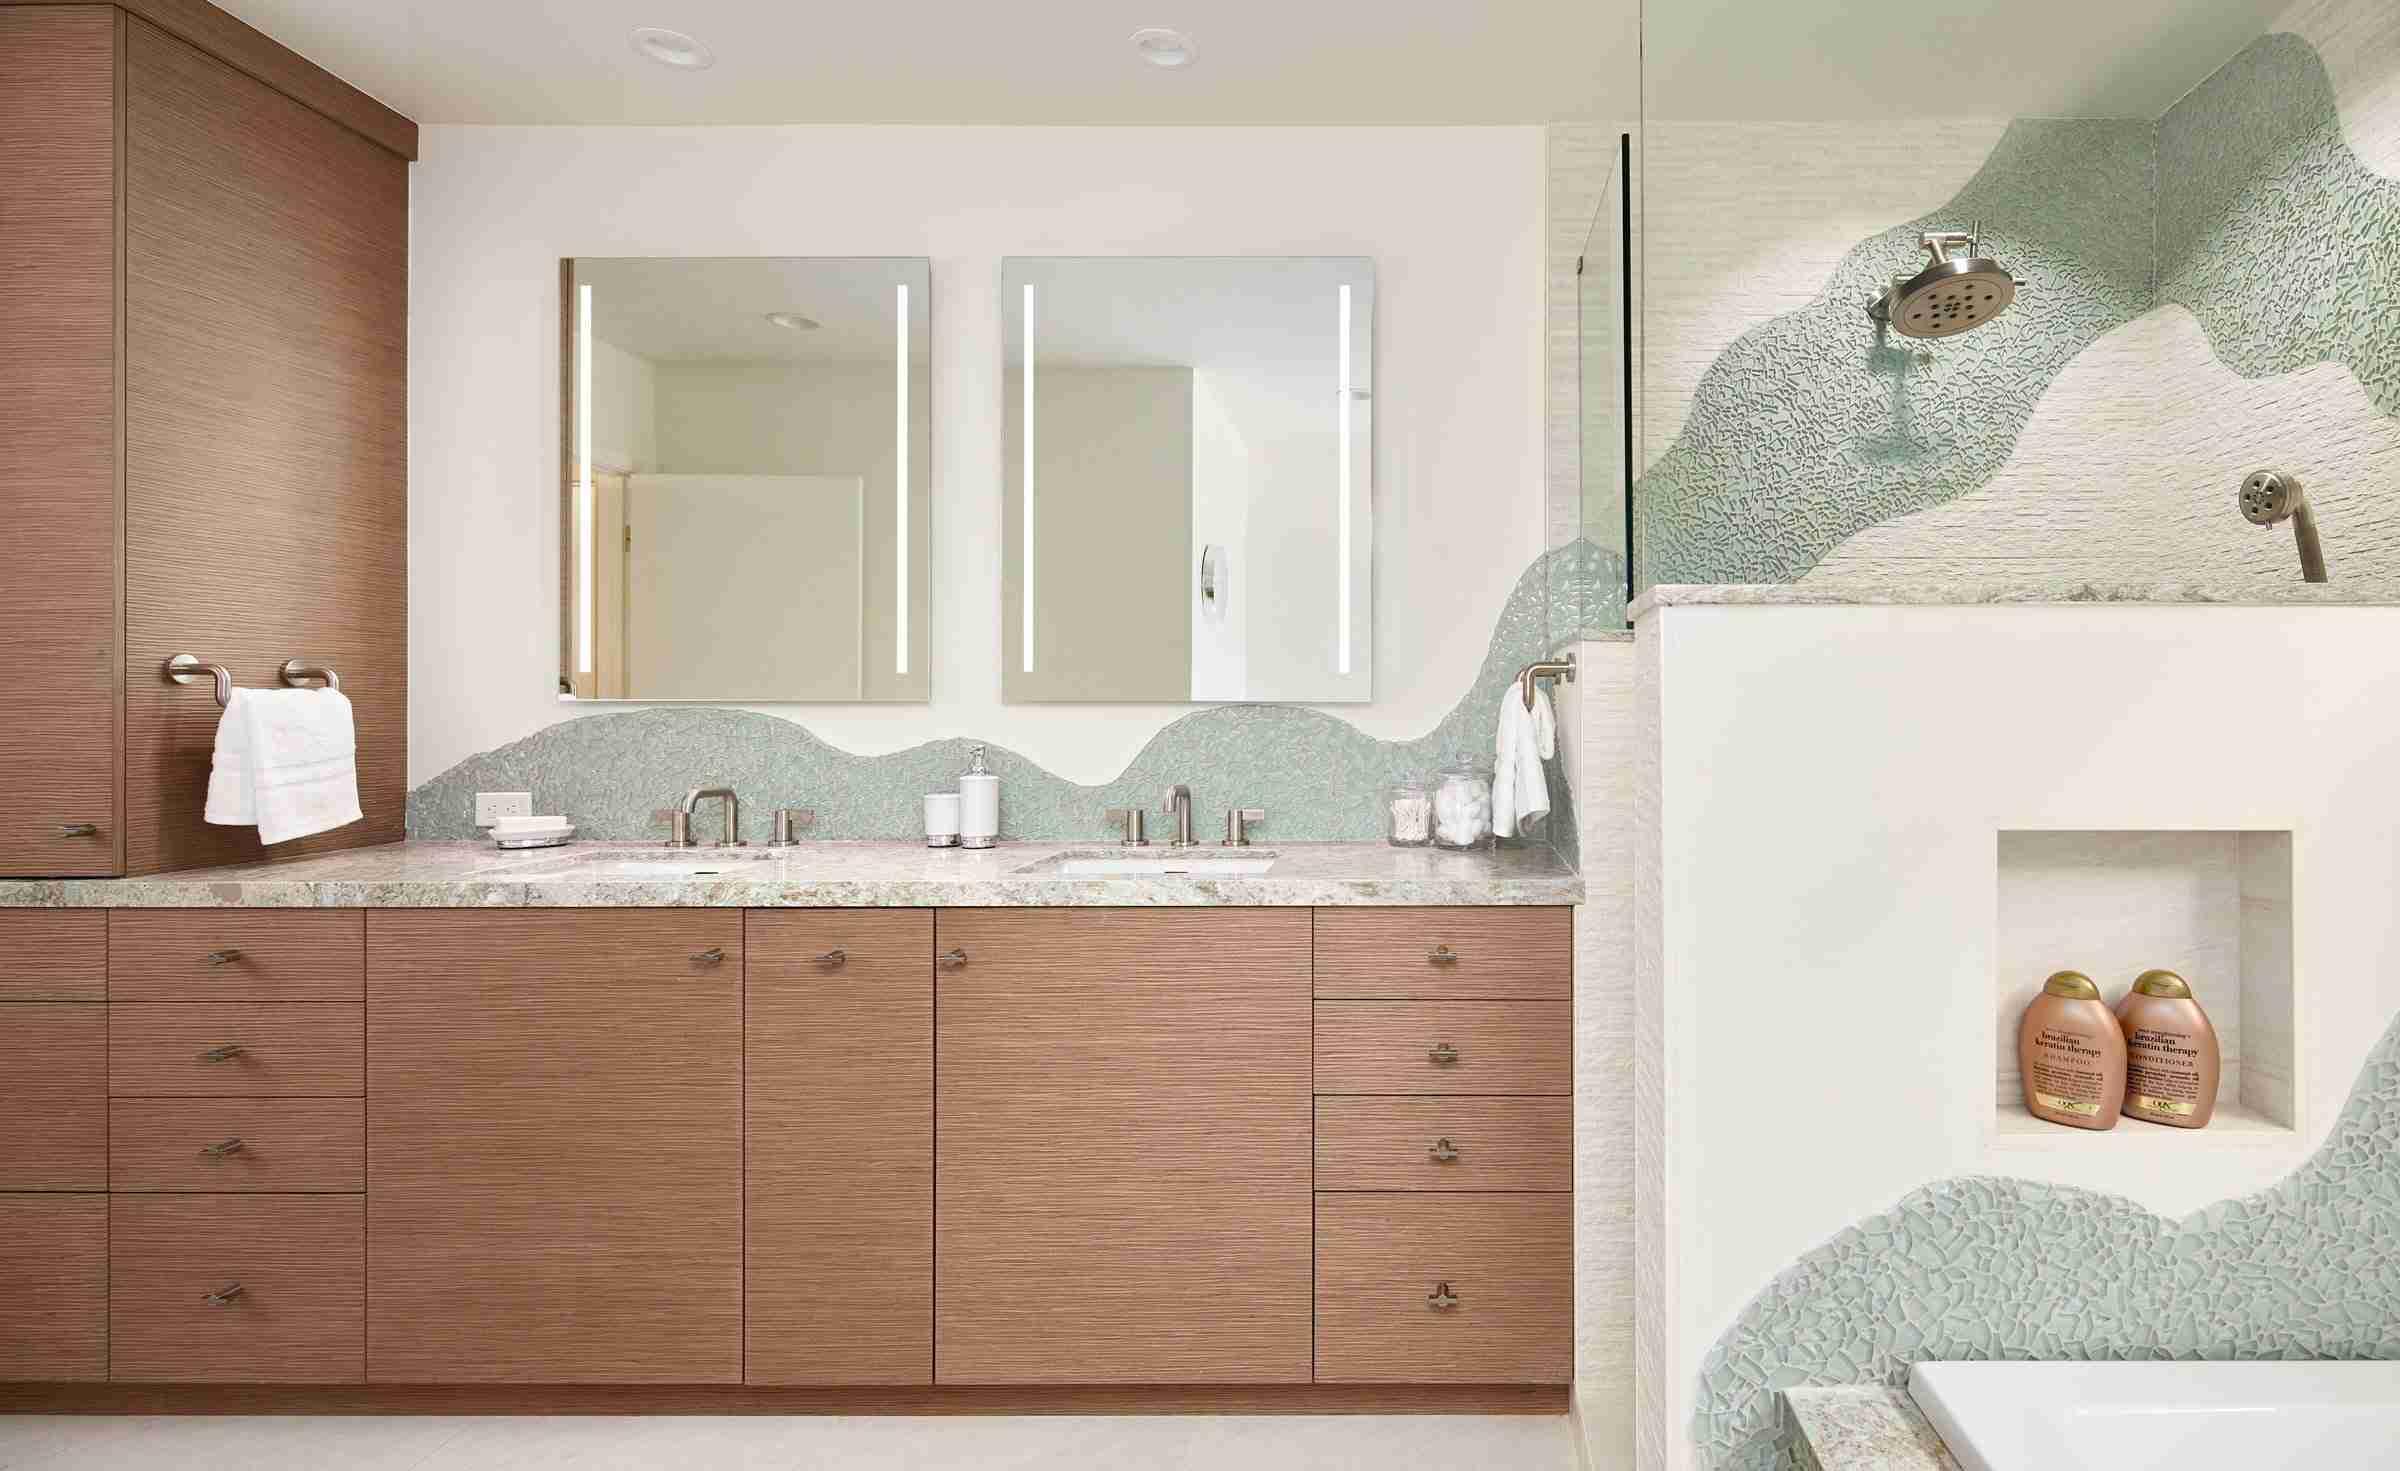 Bathroom with green wave backsplash